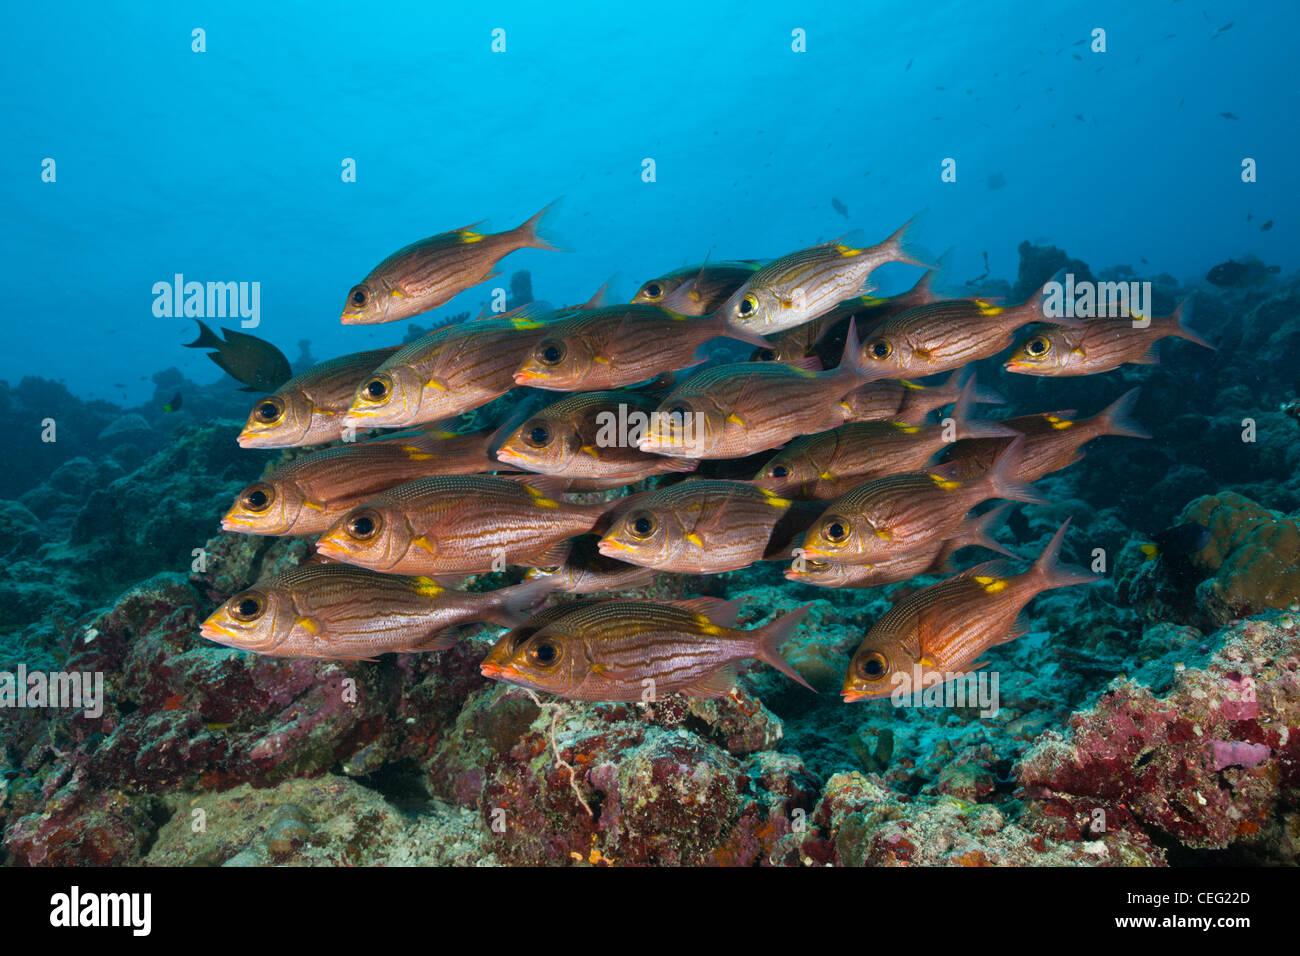 Shoal of Glowspot Emperor, Gnathodentex aurolineatus, Baa Atoll, Indian Ocean, Maldives Stock Photo